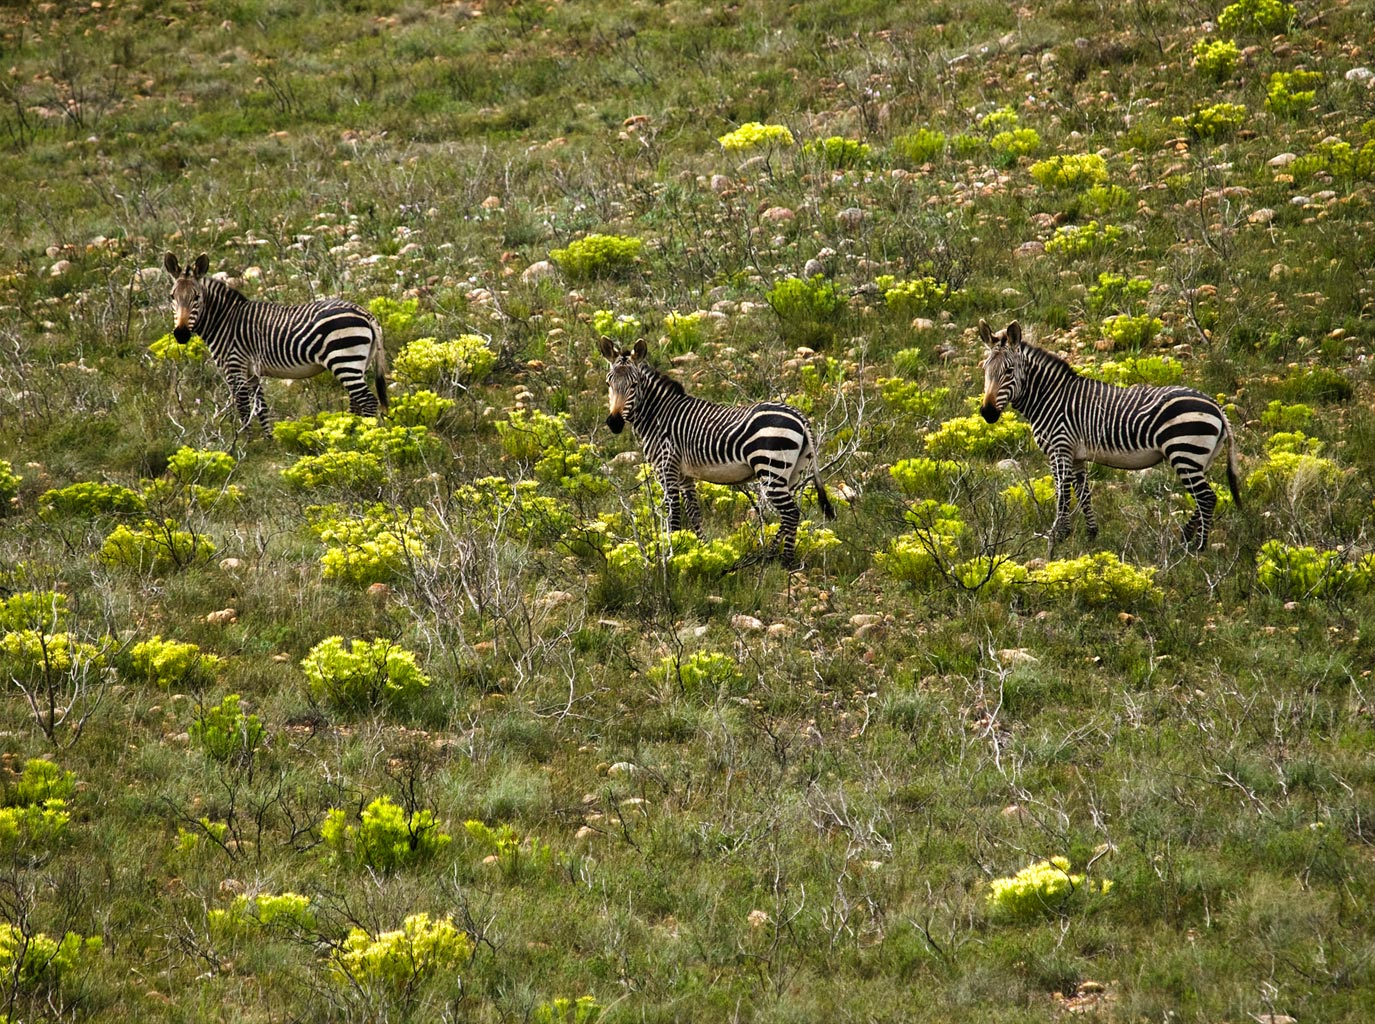 Three small zebras